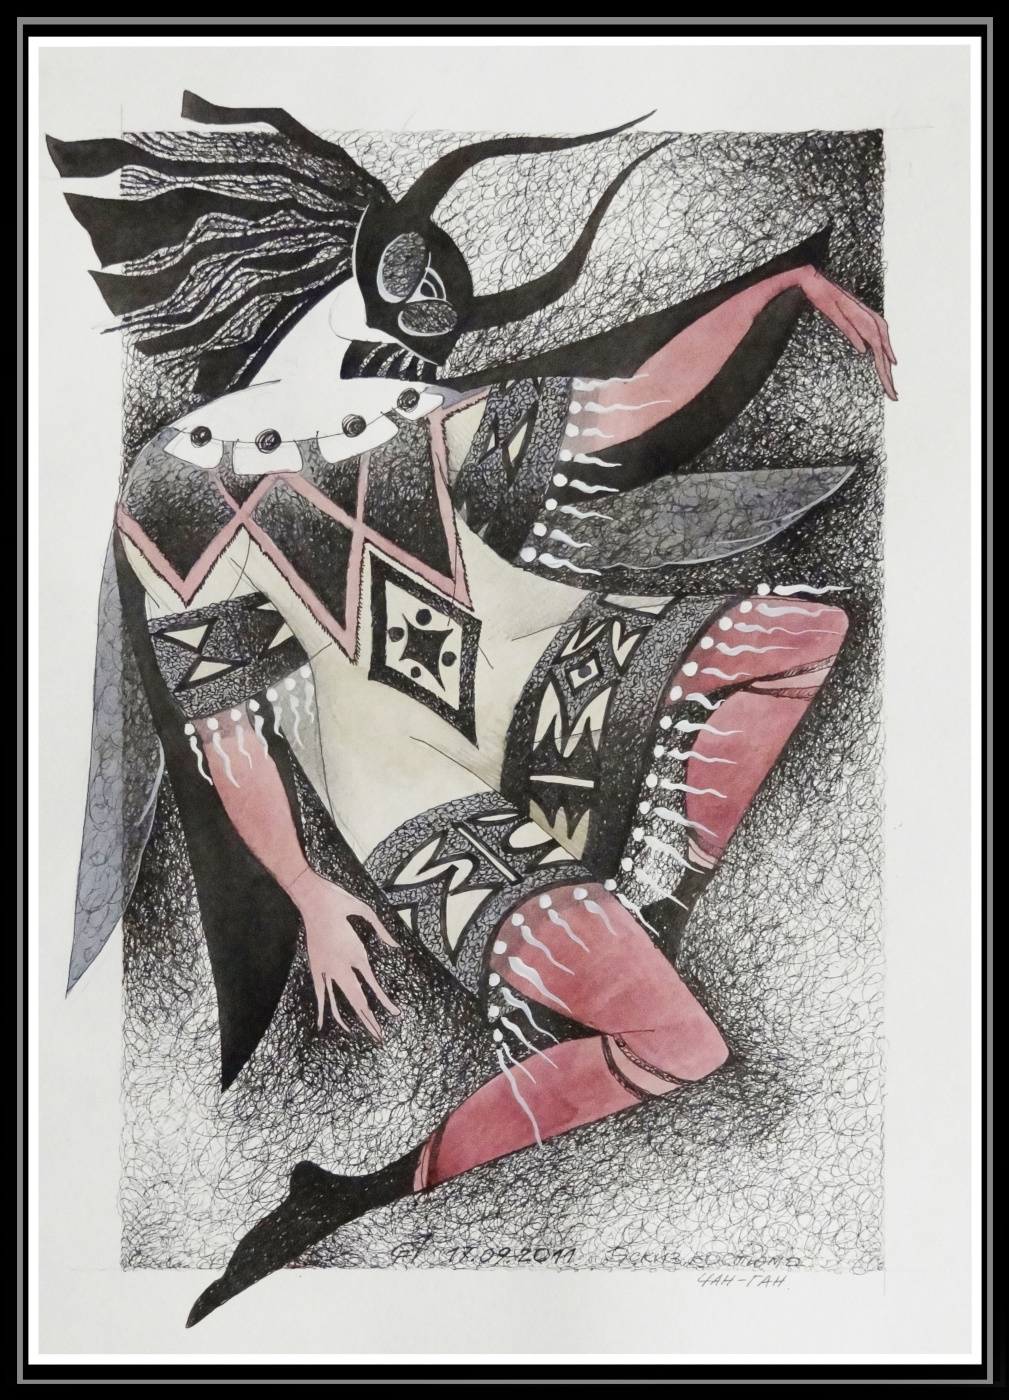 Georgy Stepanov. SKETCH COSTUME. CHAN-GAN